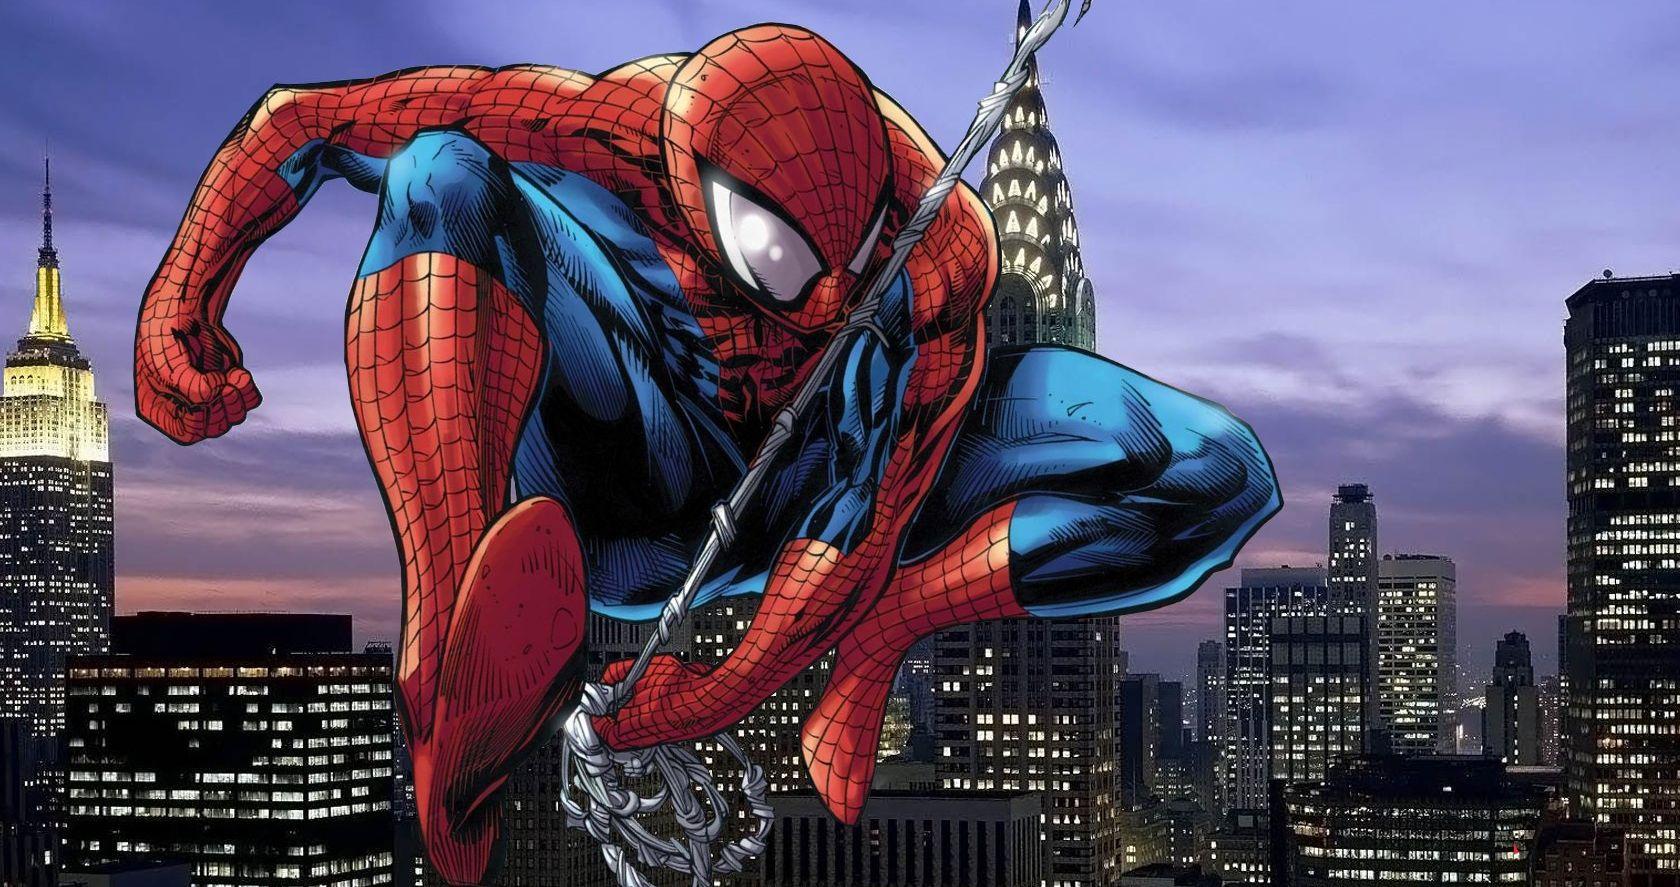 Marvel tease huge Amazing Spider-Man comic book storyline